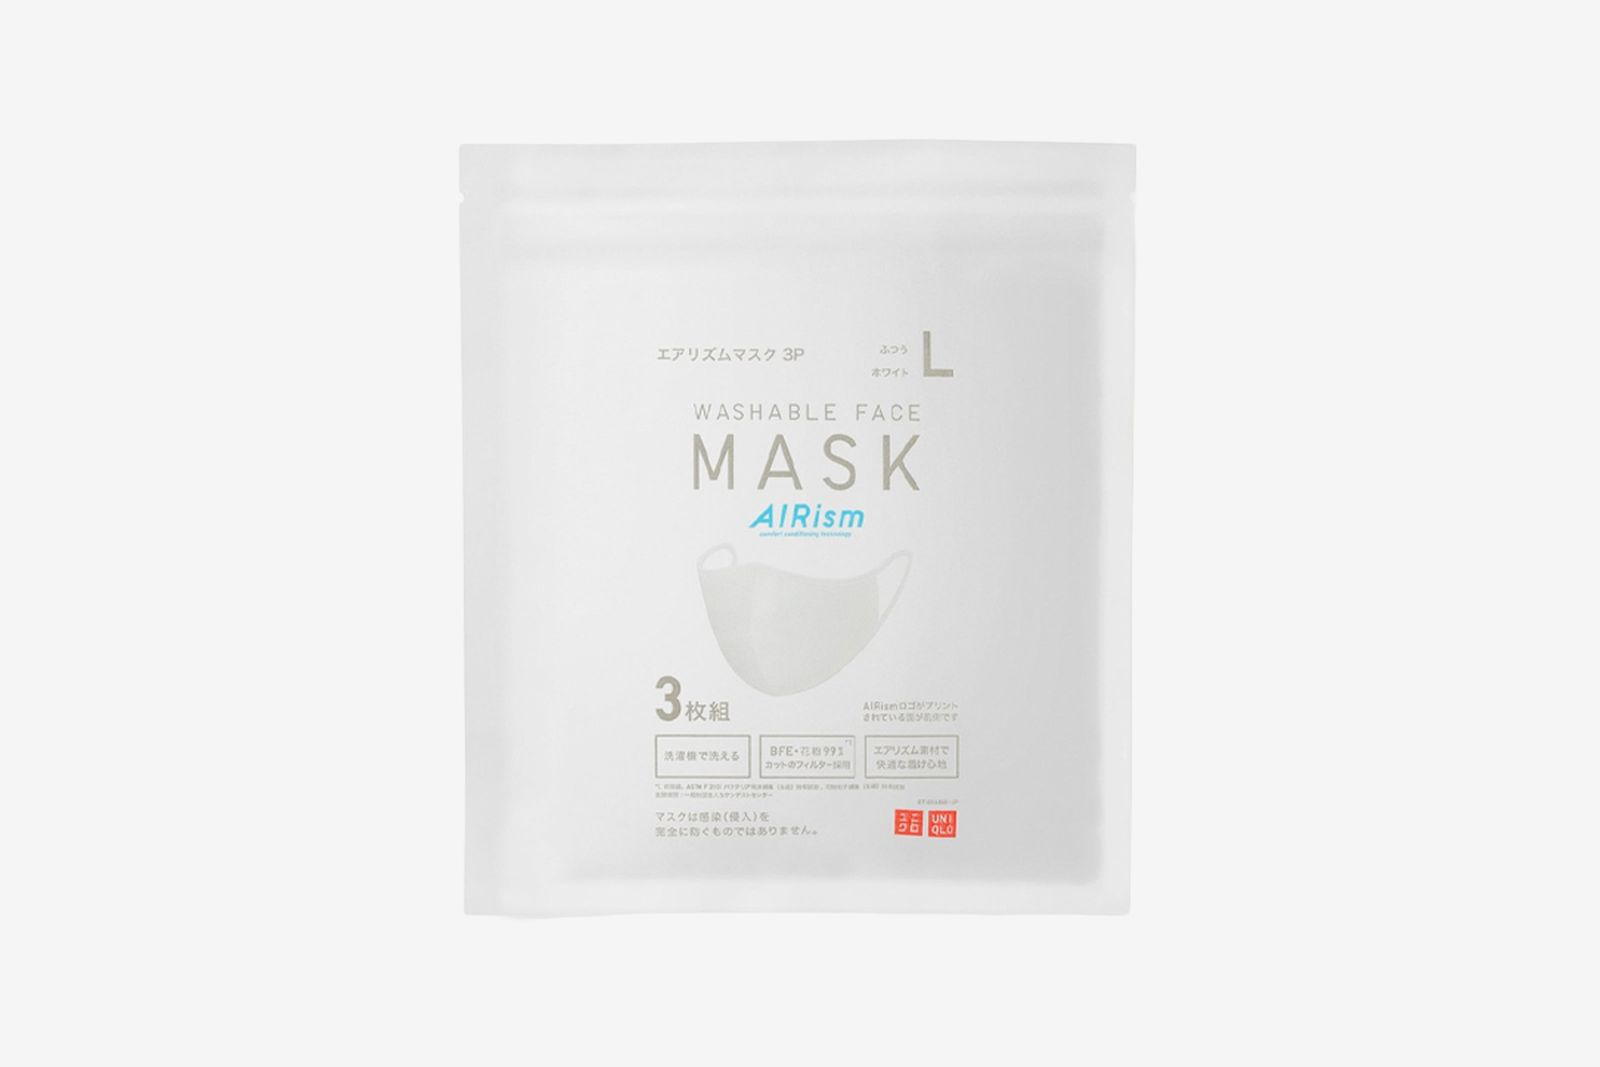 uniqlos-airism-face-masks-just-broke-brands-website-japan-main01